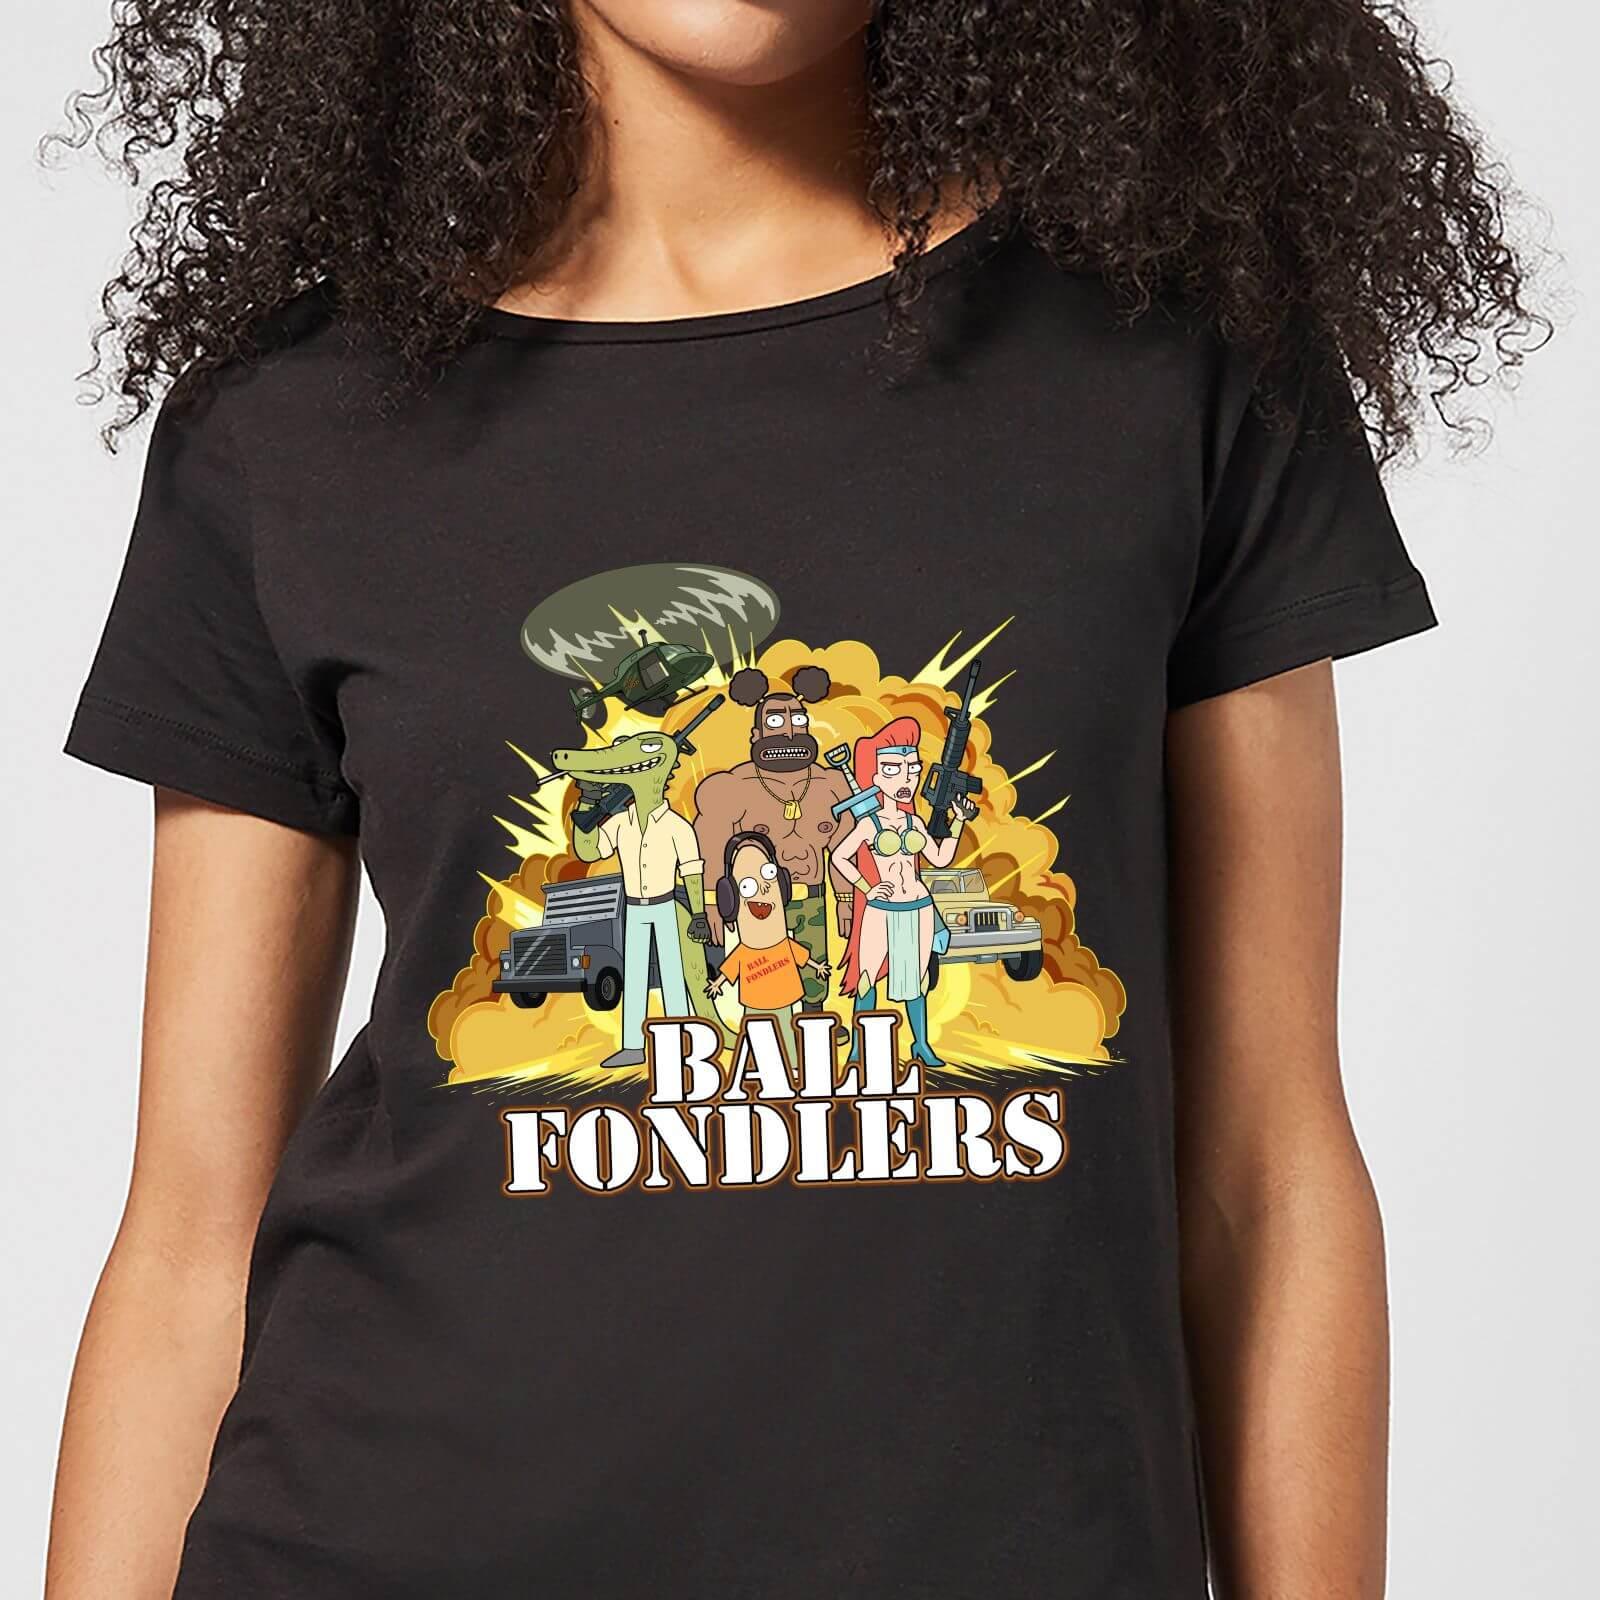 Rick and Morty Ball Fondlers Women's T-Shirt - Black - M - Black